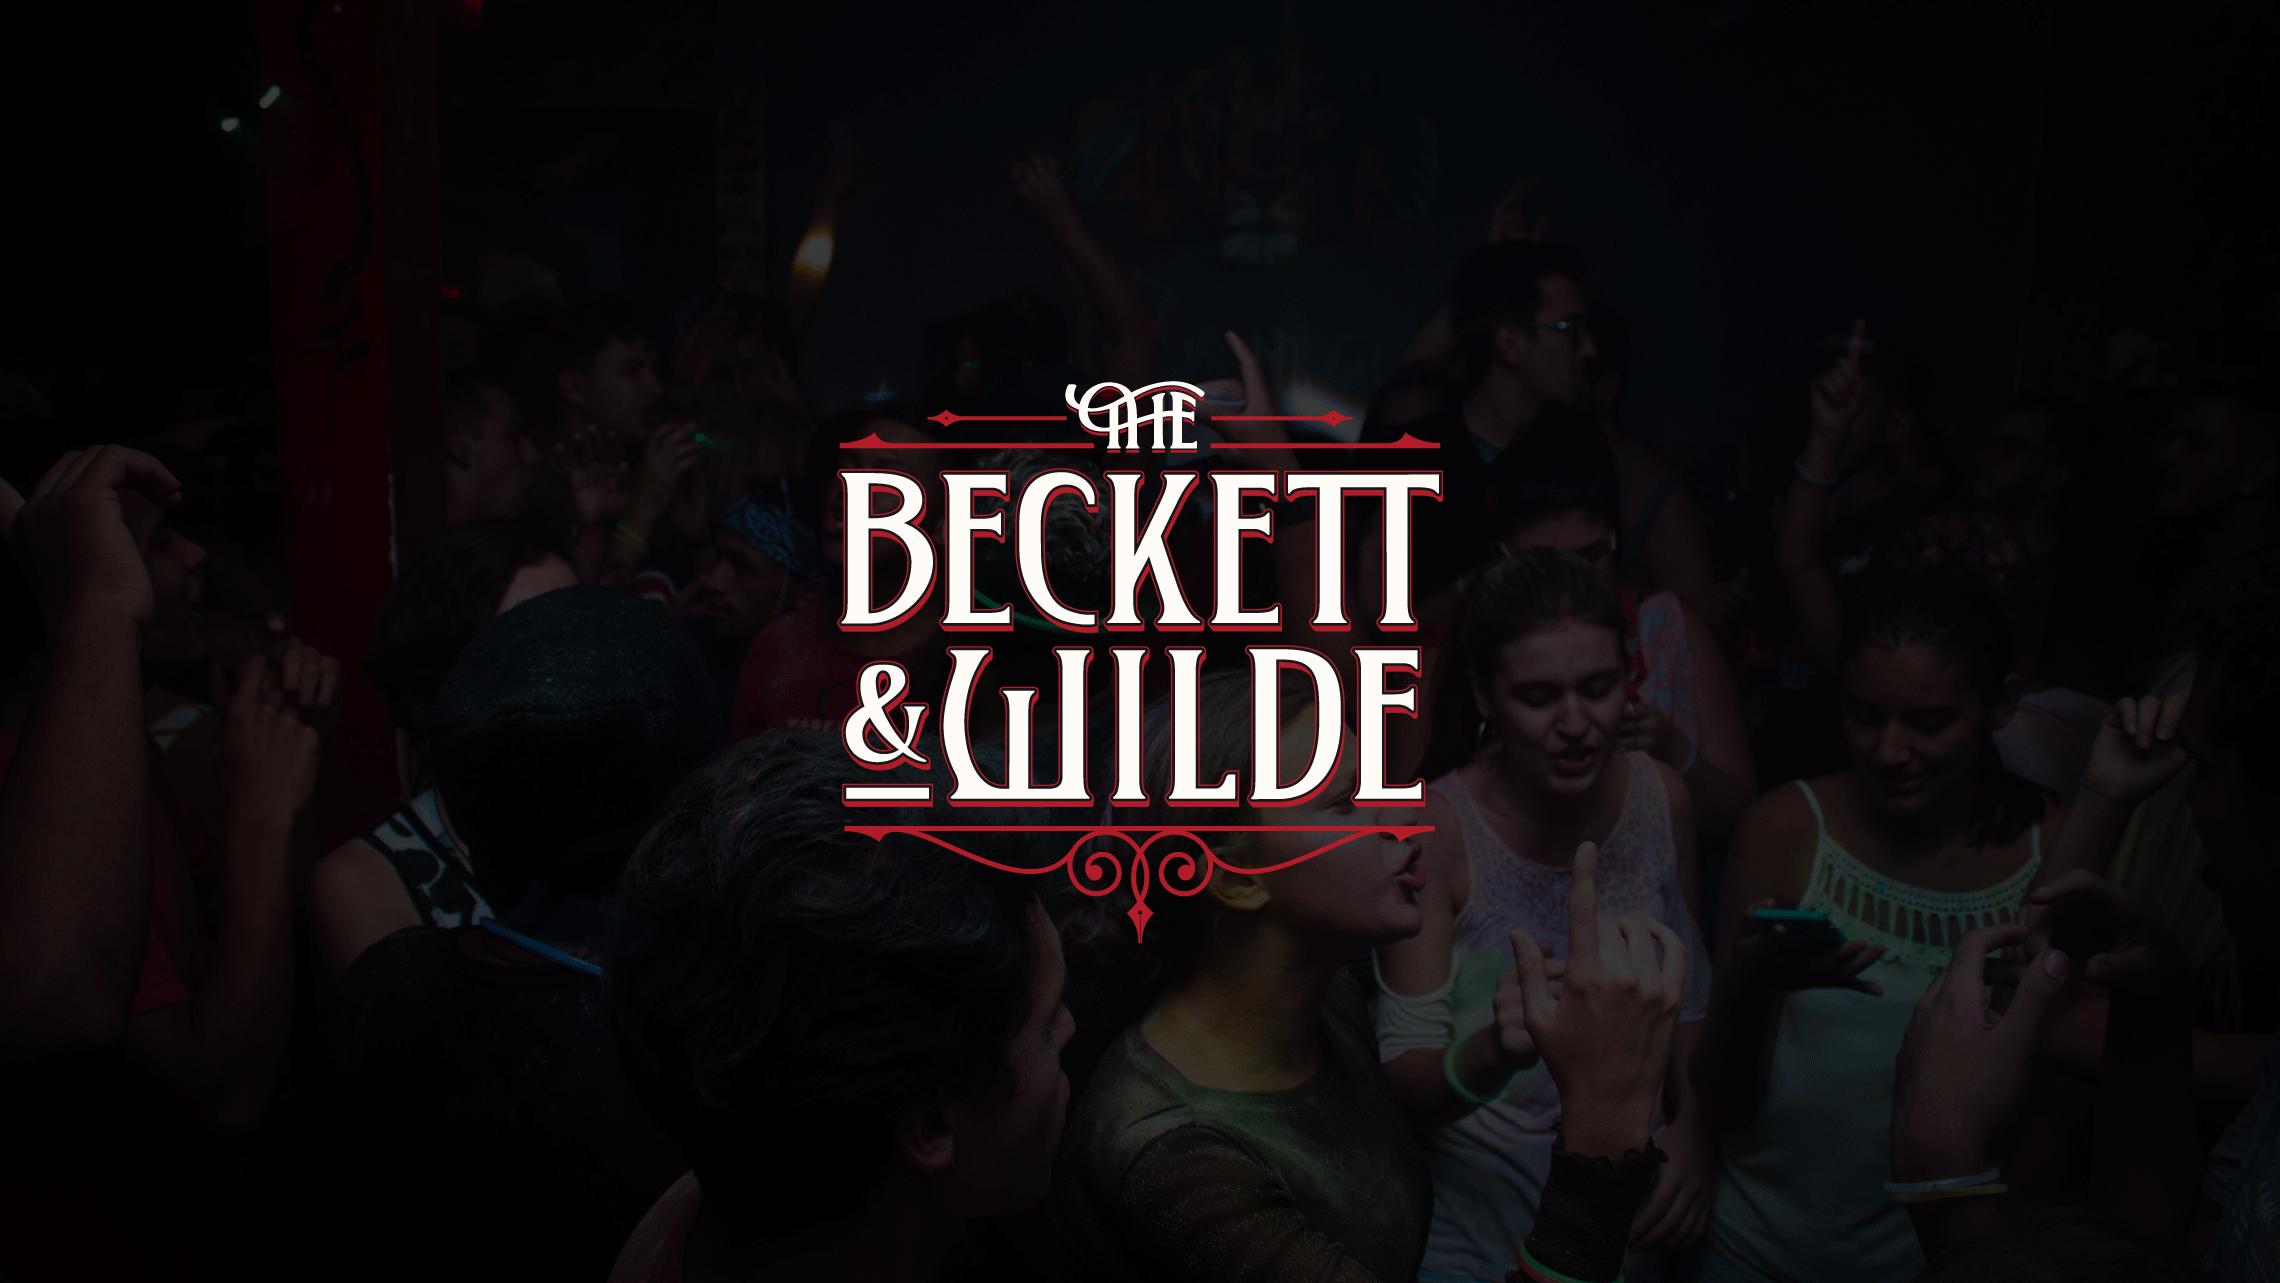 The Beckett & Wilde Pub